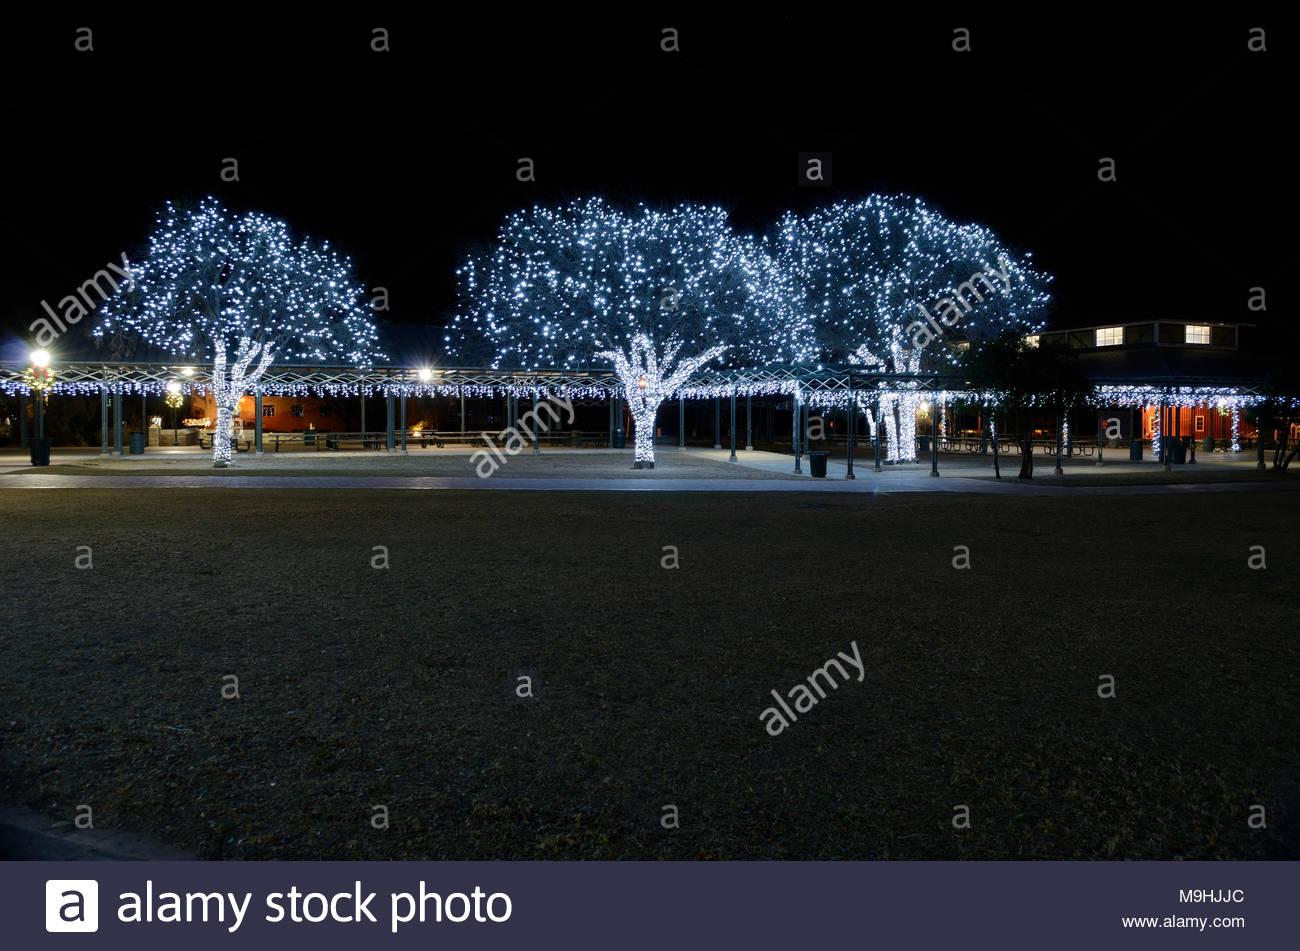 Navidad En Fredericksburg Texas Fotos e Imágenes de stock   Alamy